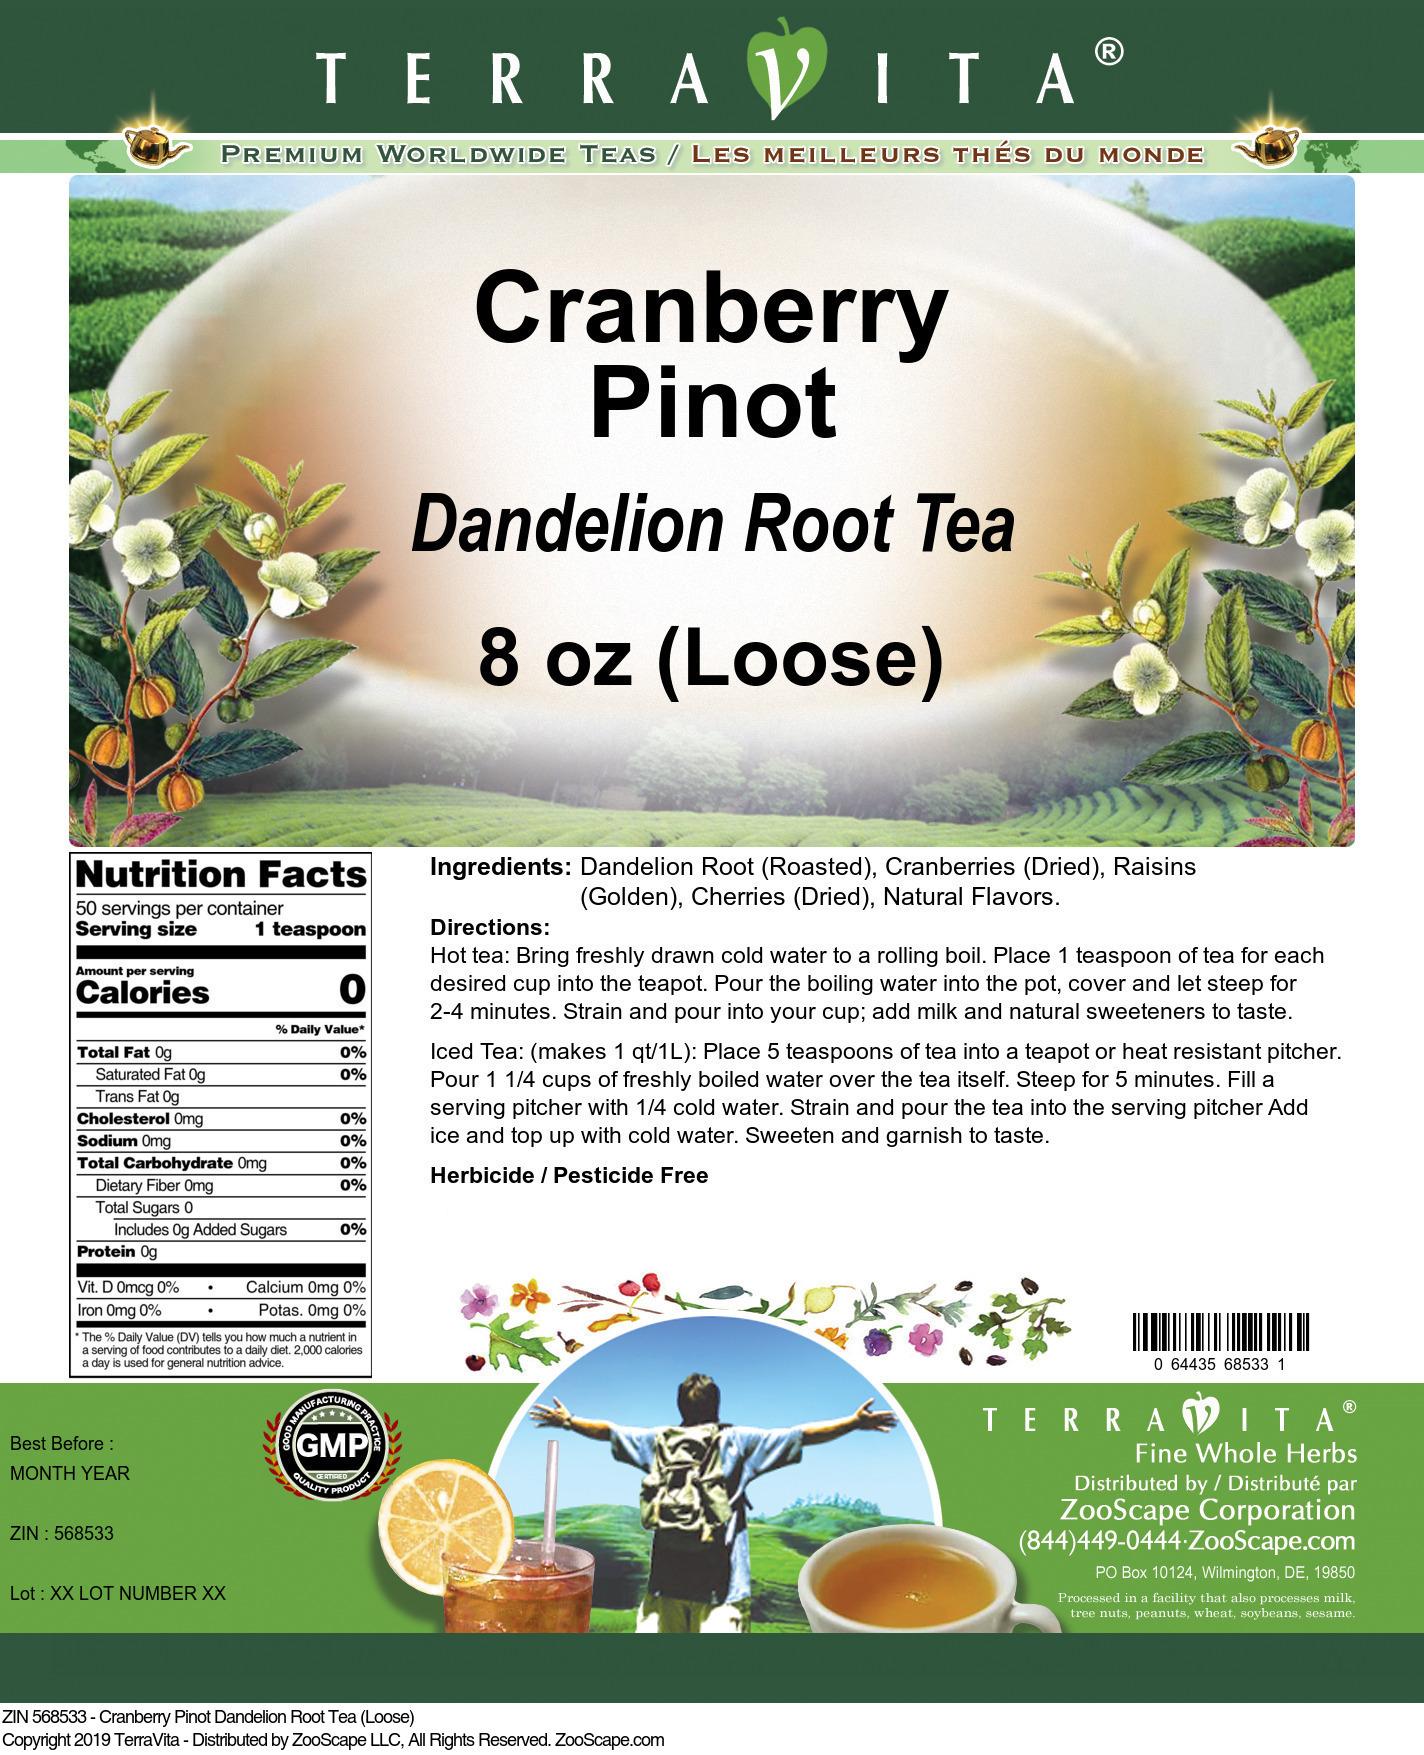 Cranberry Pinot Dandelion Root